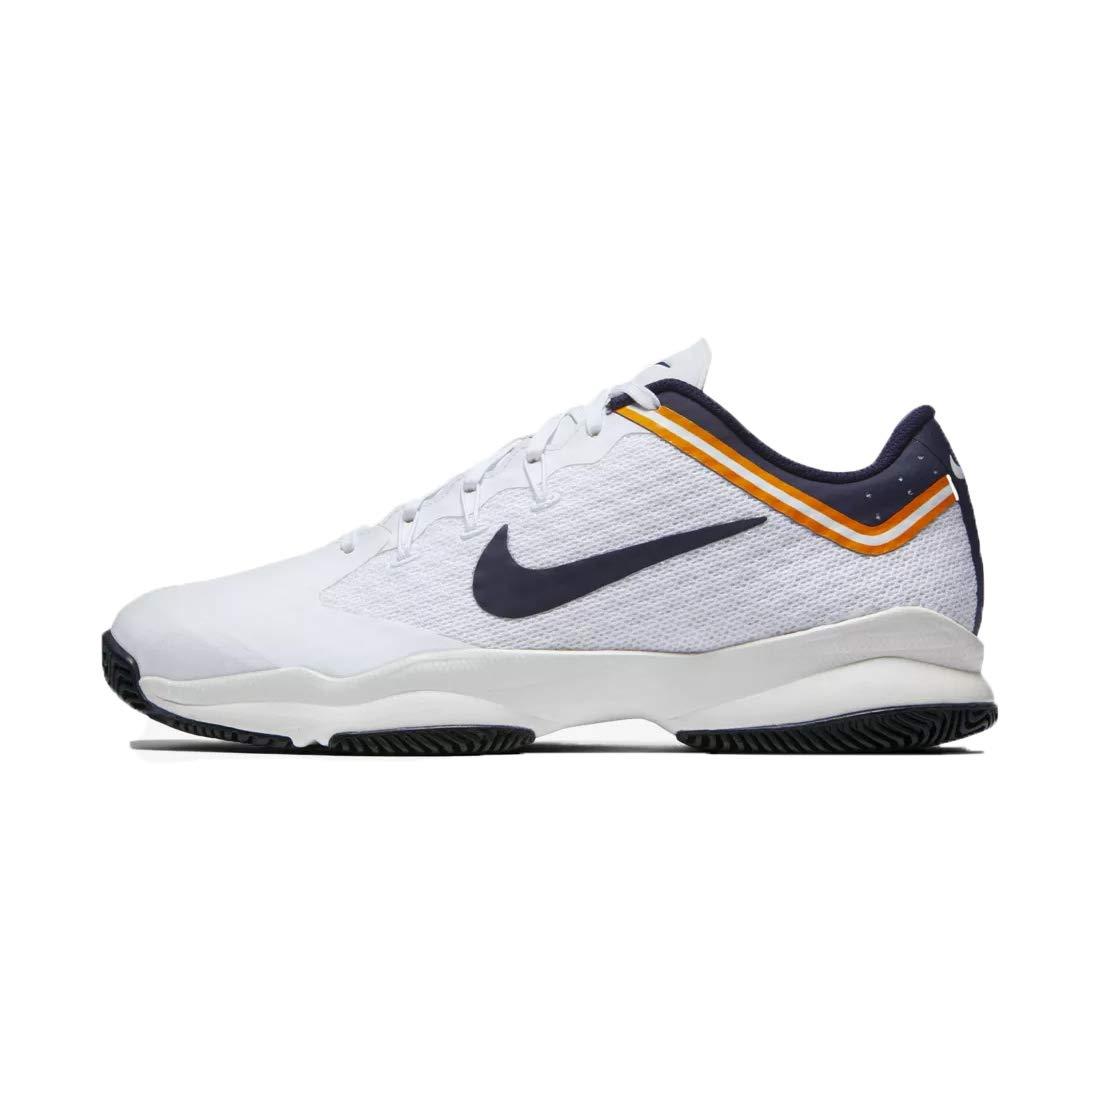 Nike Tennisschuh Air Zoom Ultra Hard Court, Scarpe da Tennis